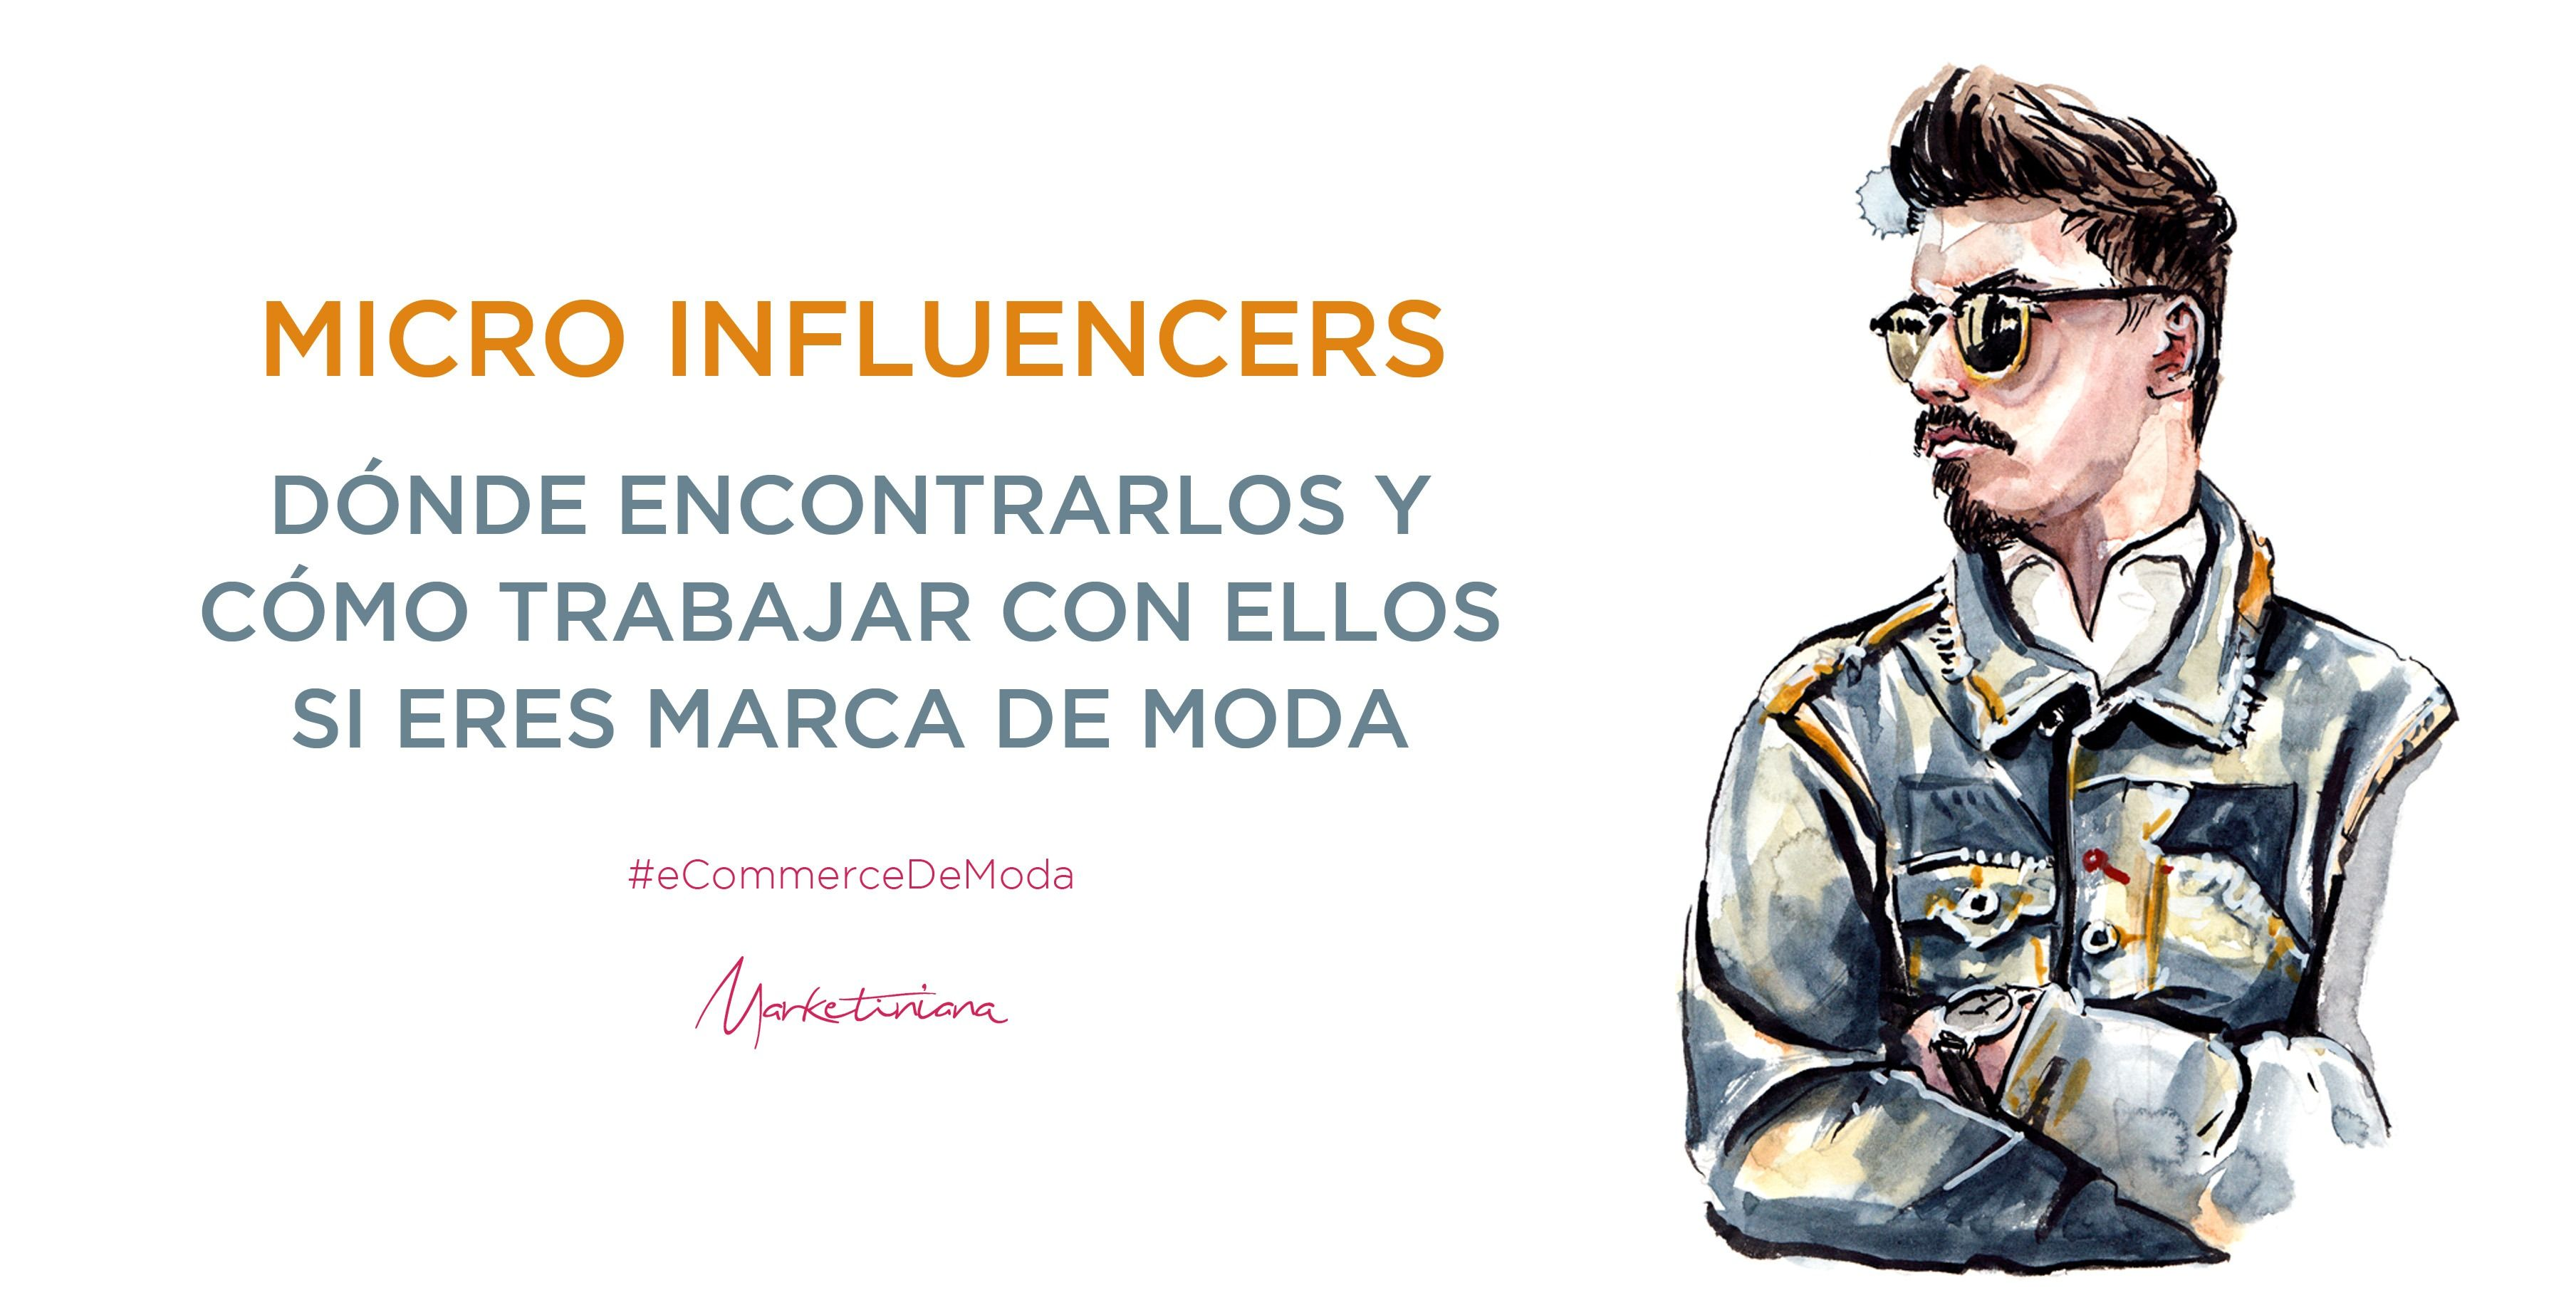 Microinfluencers-en-Moda-Ana-Diaz-del-Rio-Portada.jpg